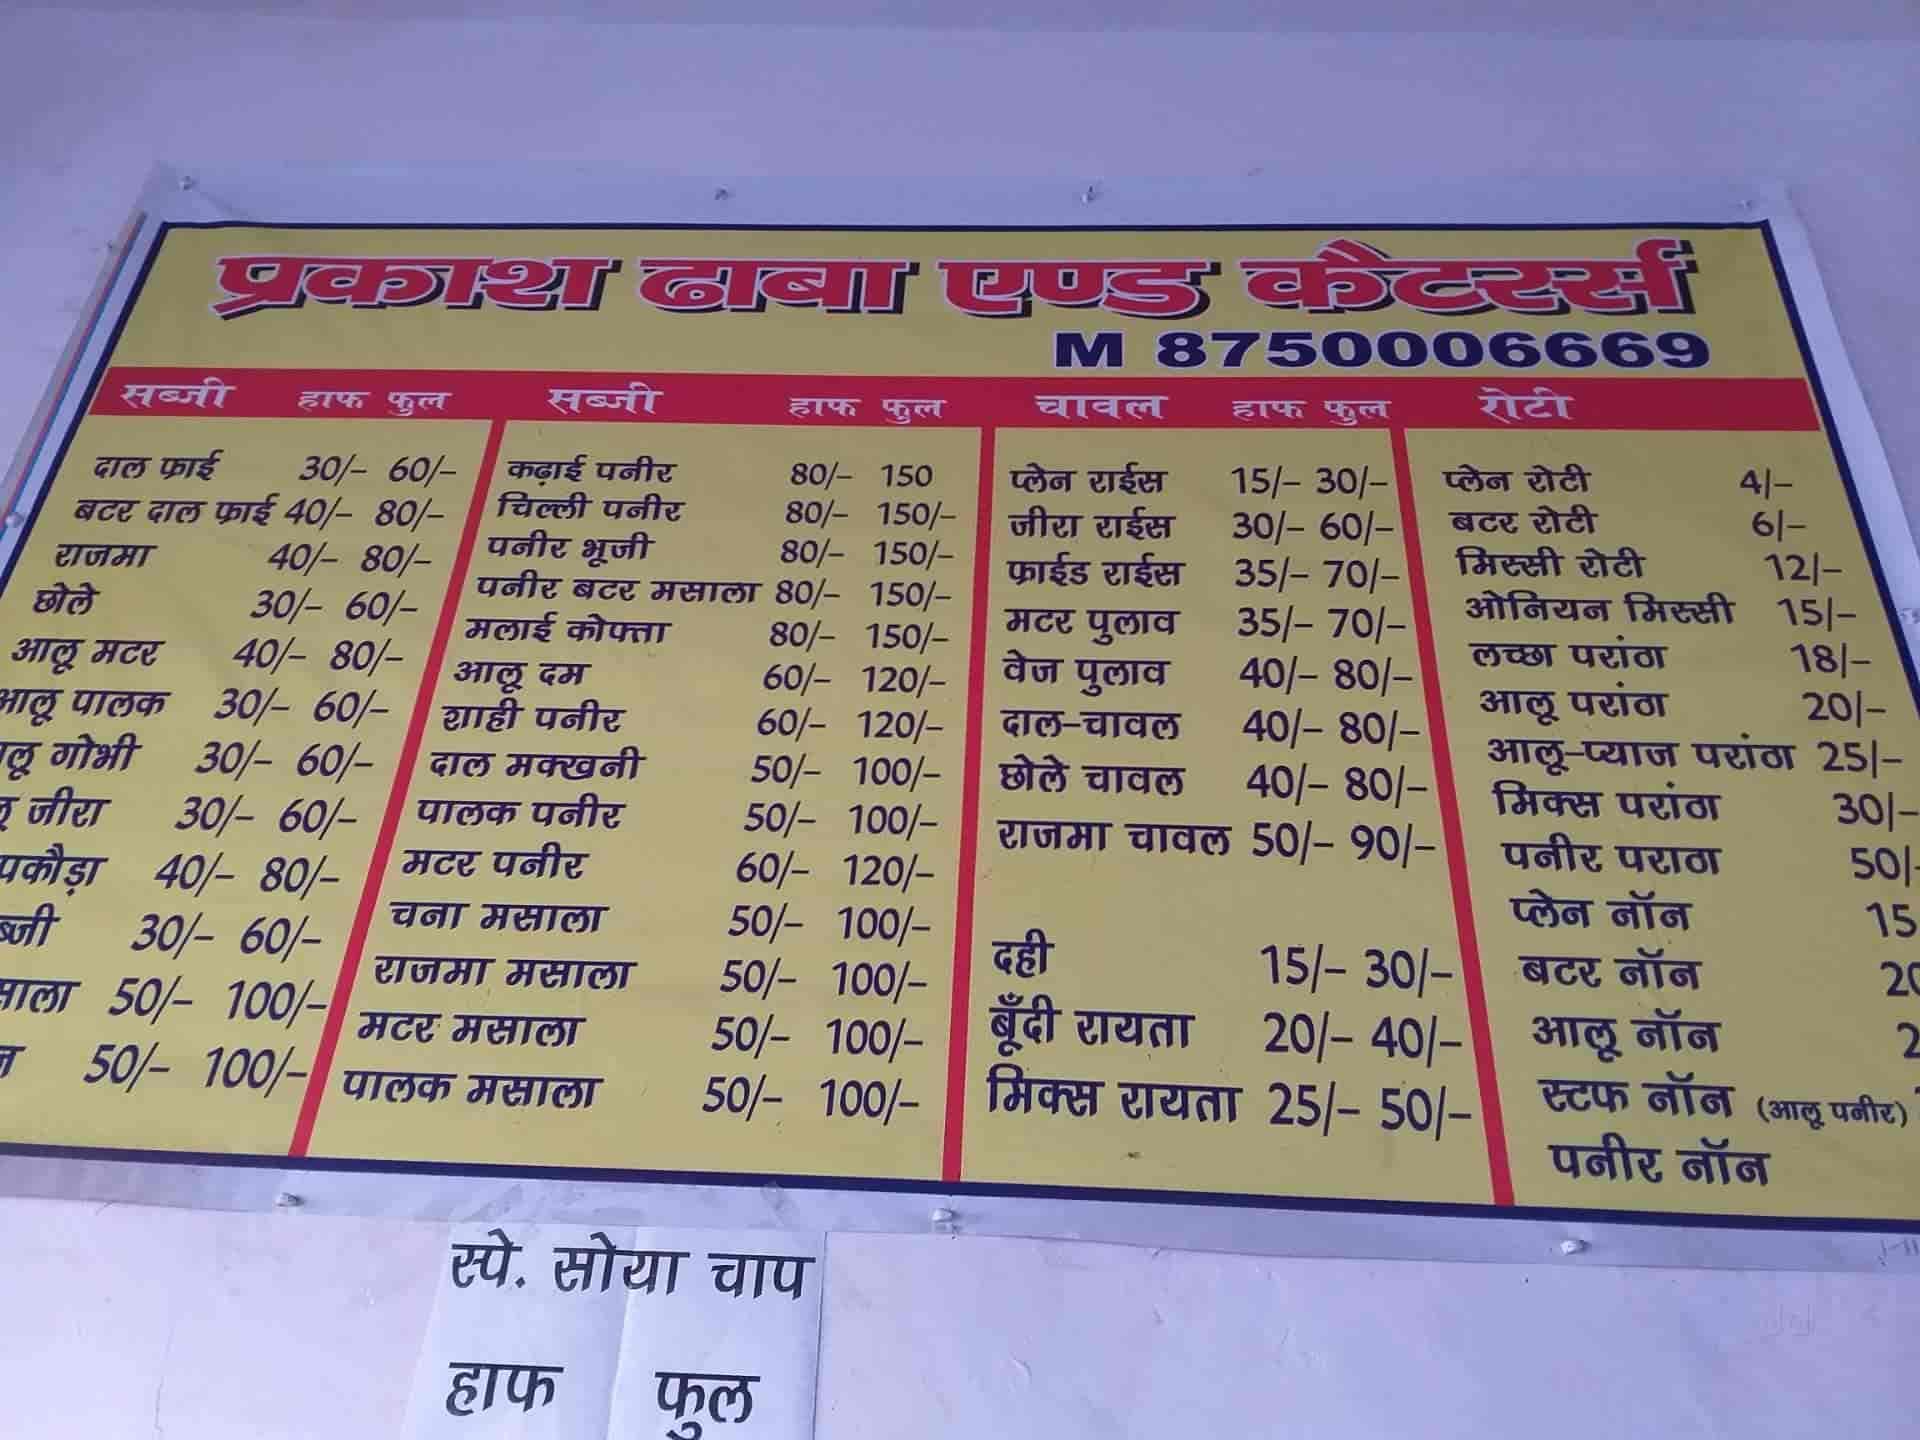 indian bank branch locator in delhi